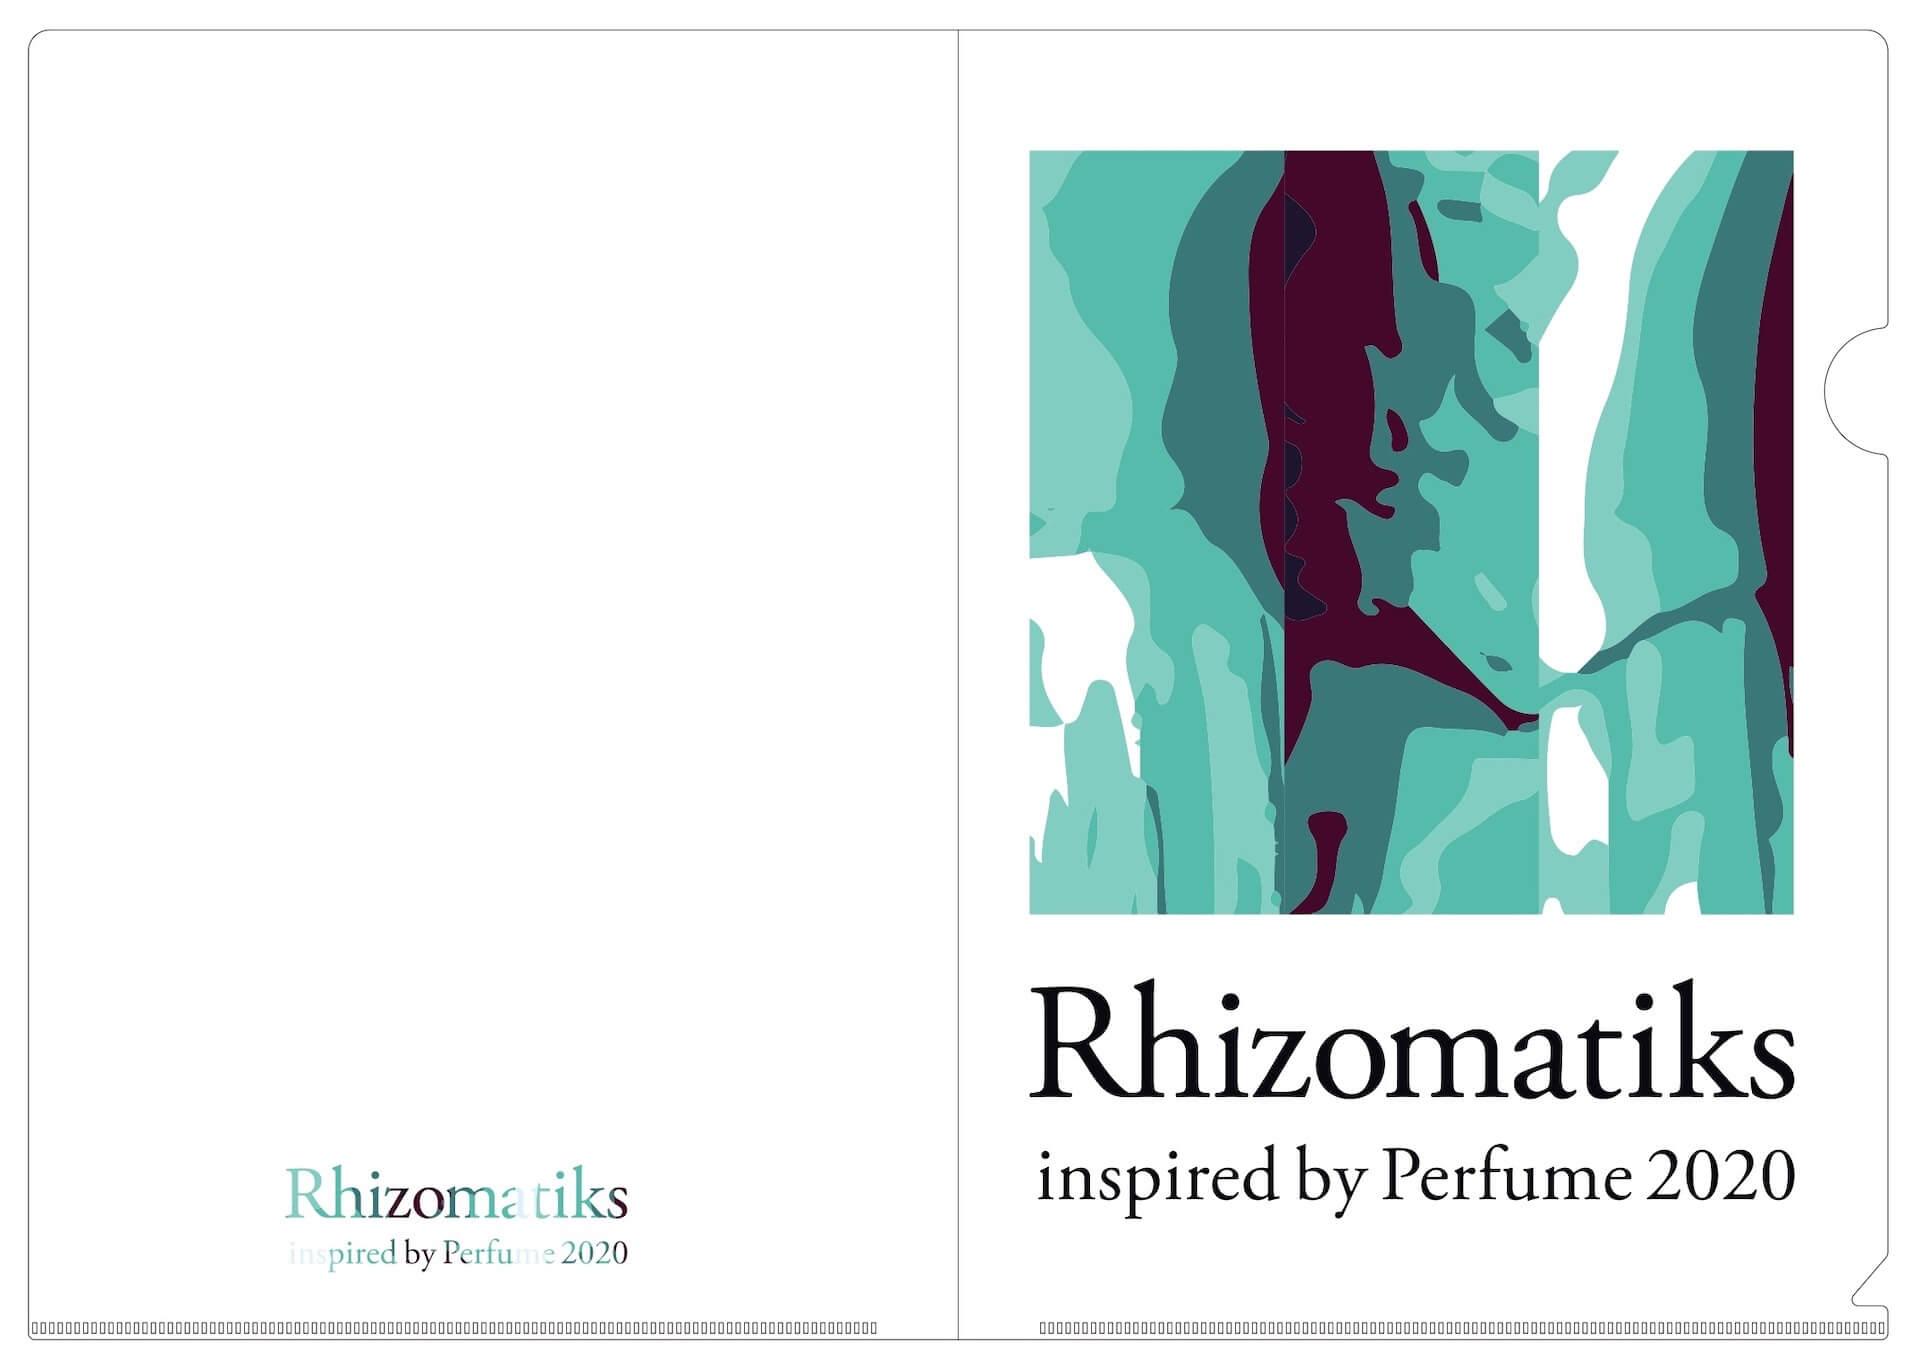 Perfume舞台演出の裏側を体験!<Rhizomatiks inspired by Perfume 2020>が渋谷PARCO MUSEUMで開催! ac200109_rhizomatiksparco_06